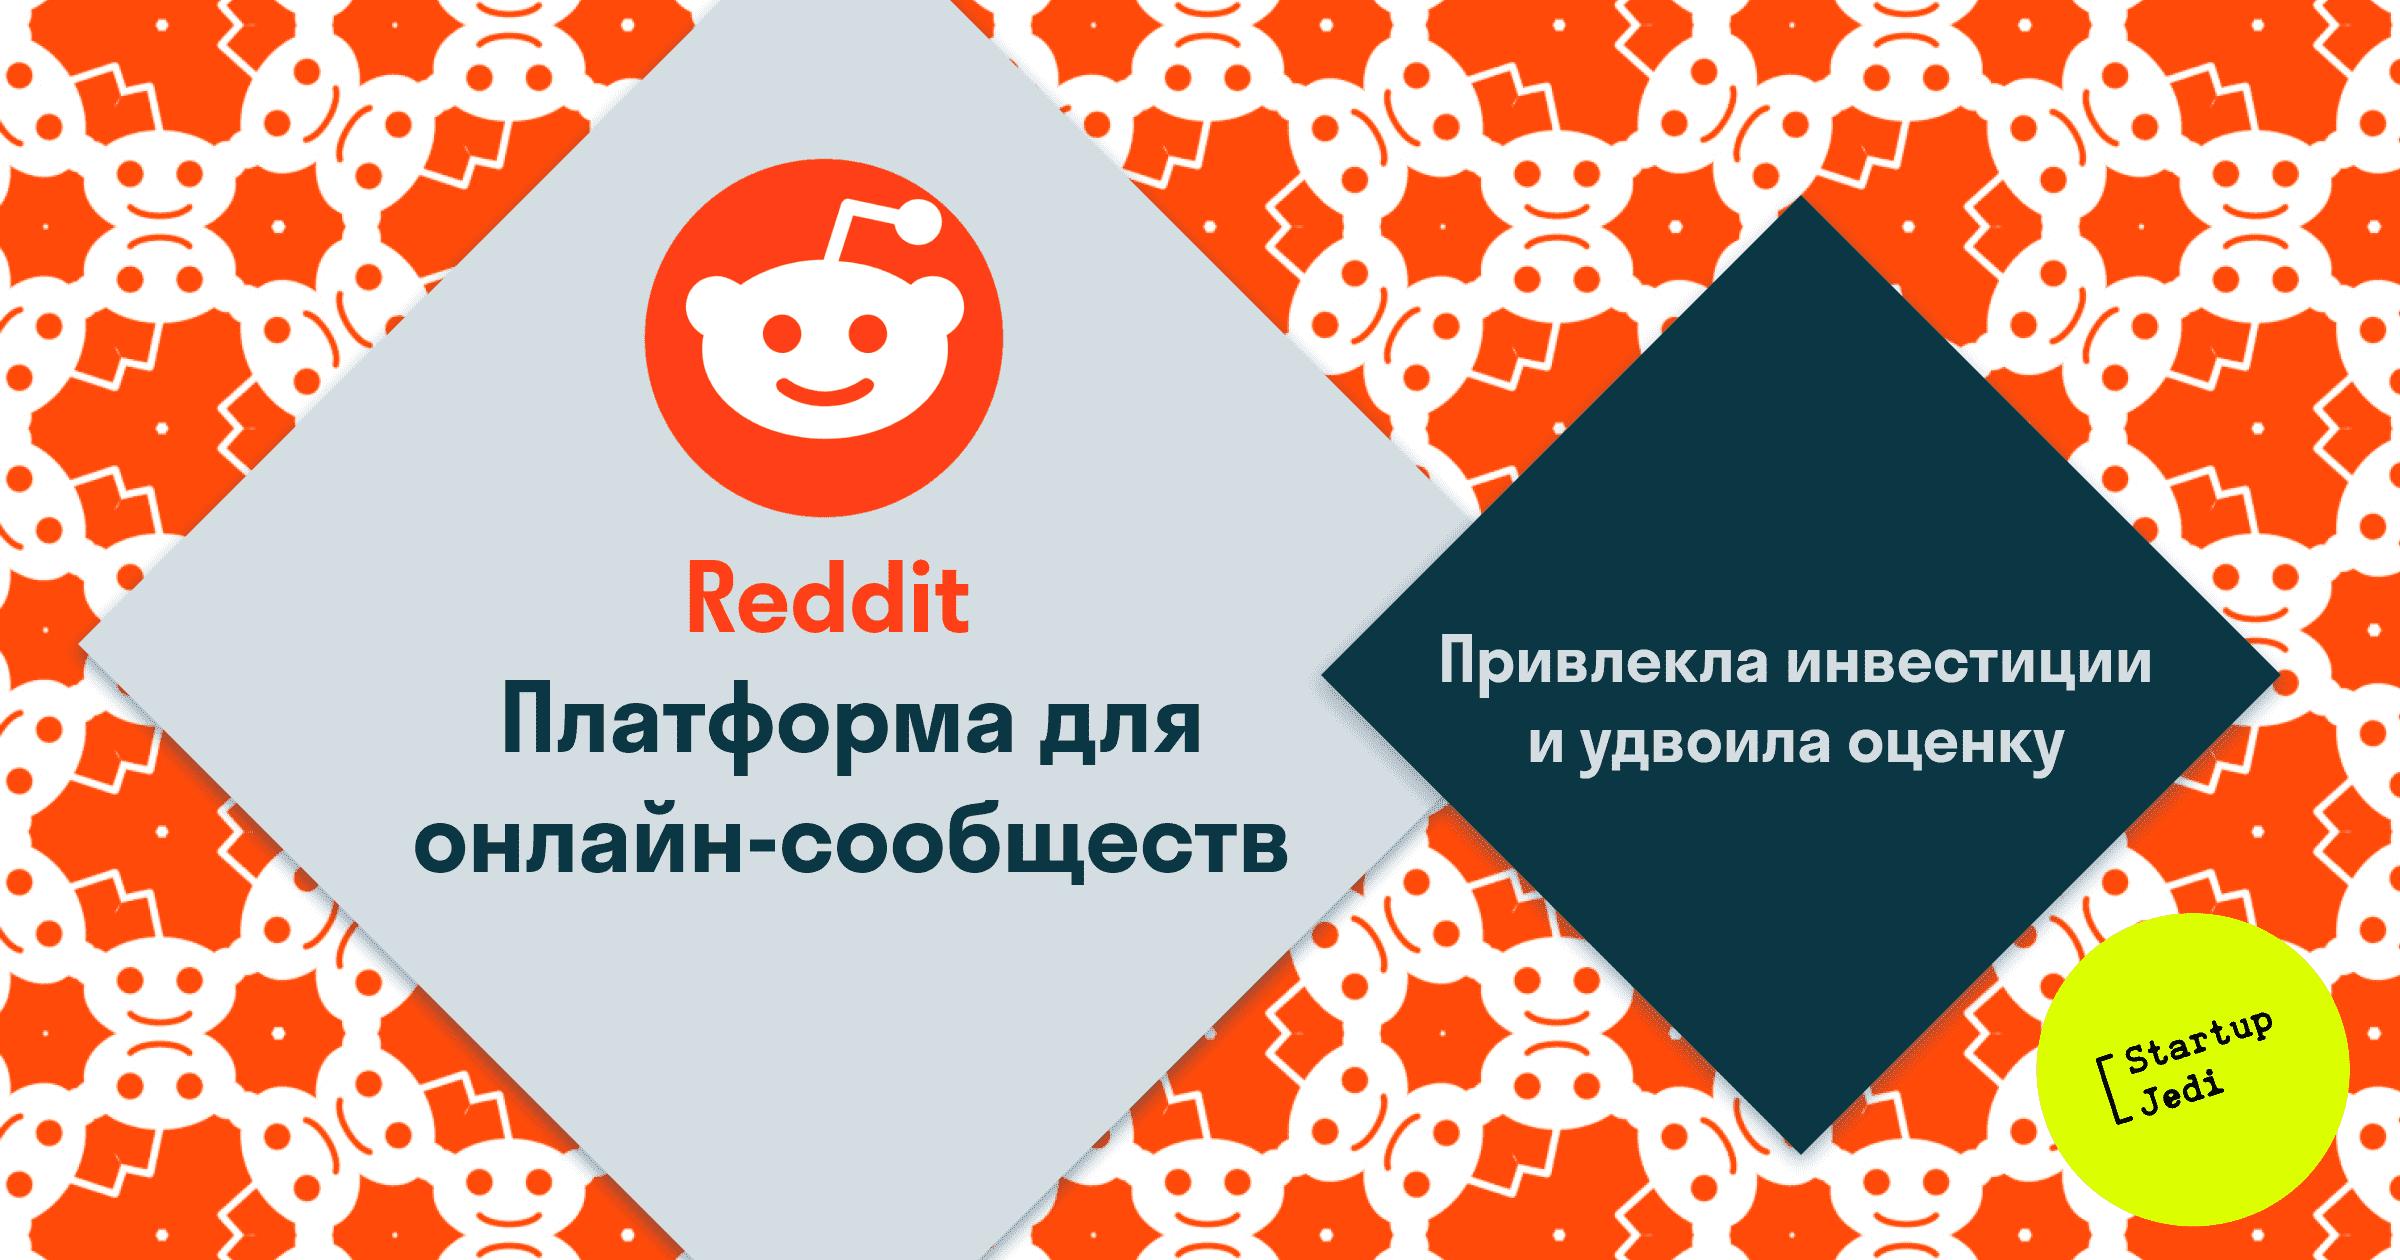 Reddit raises its valuation to $6B